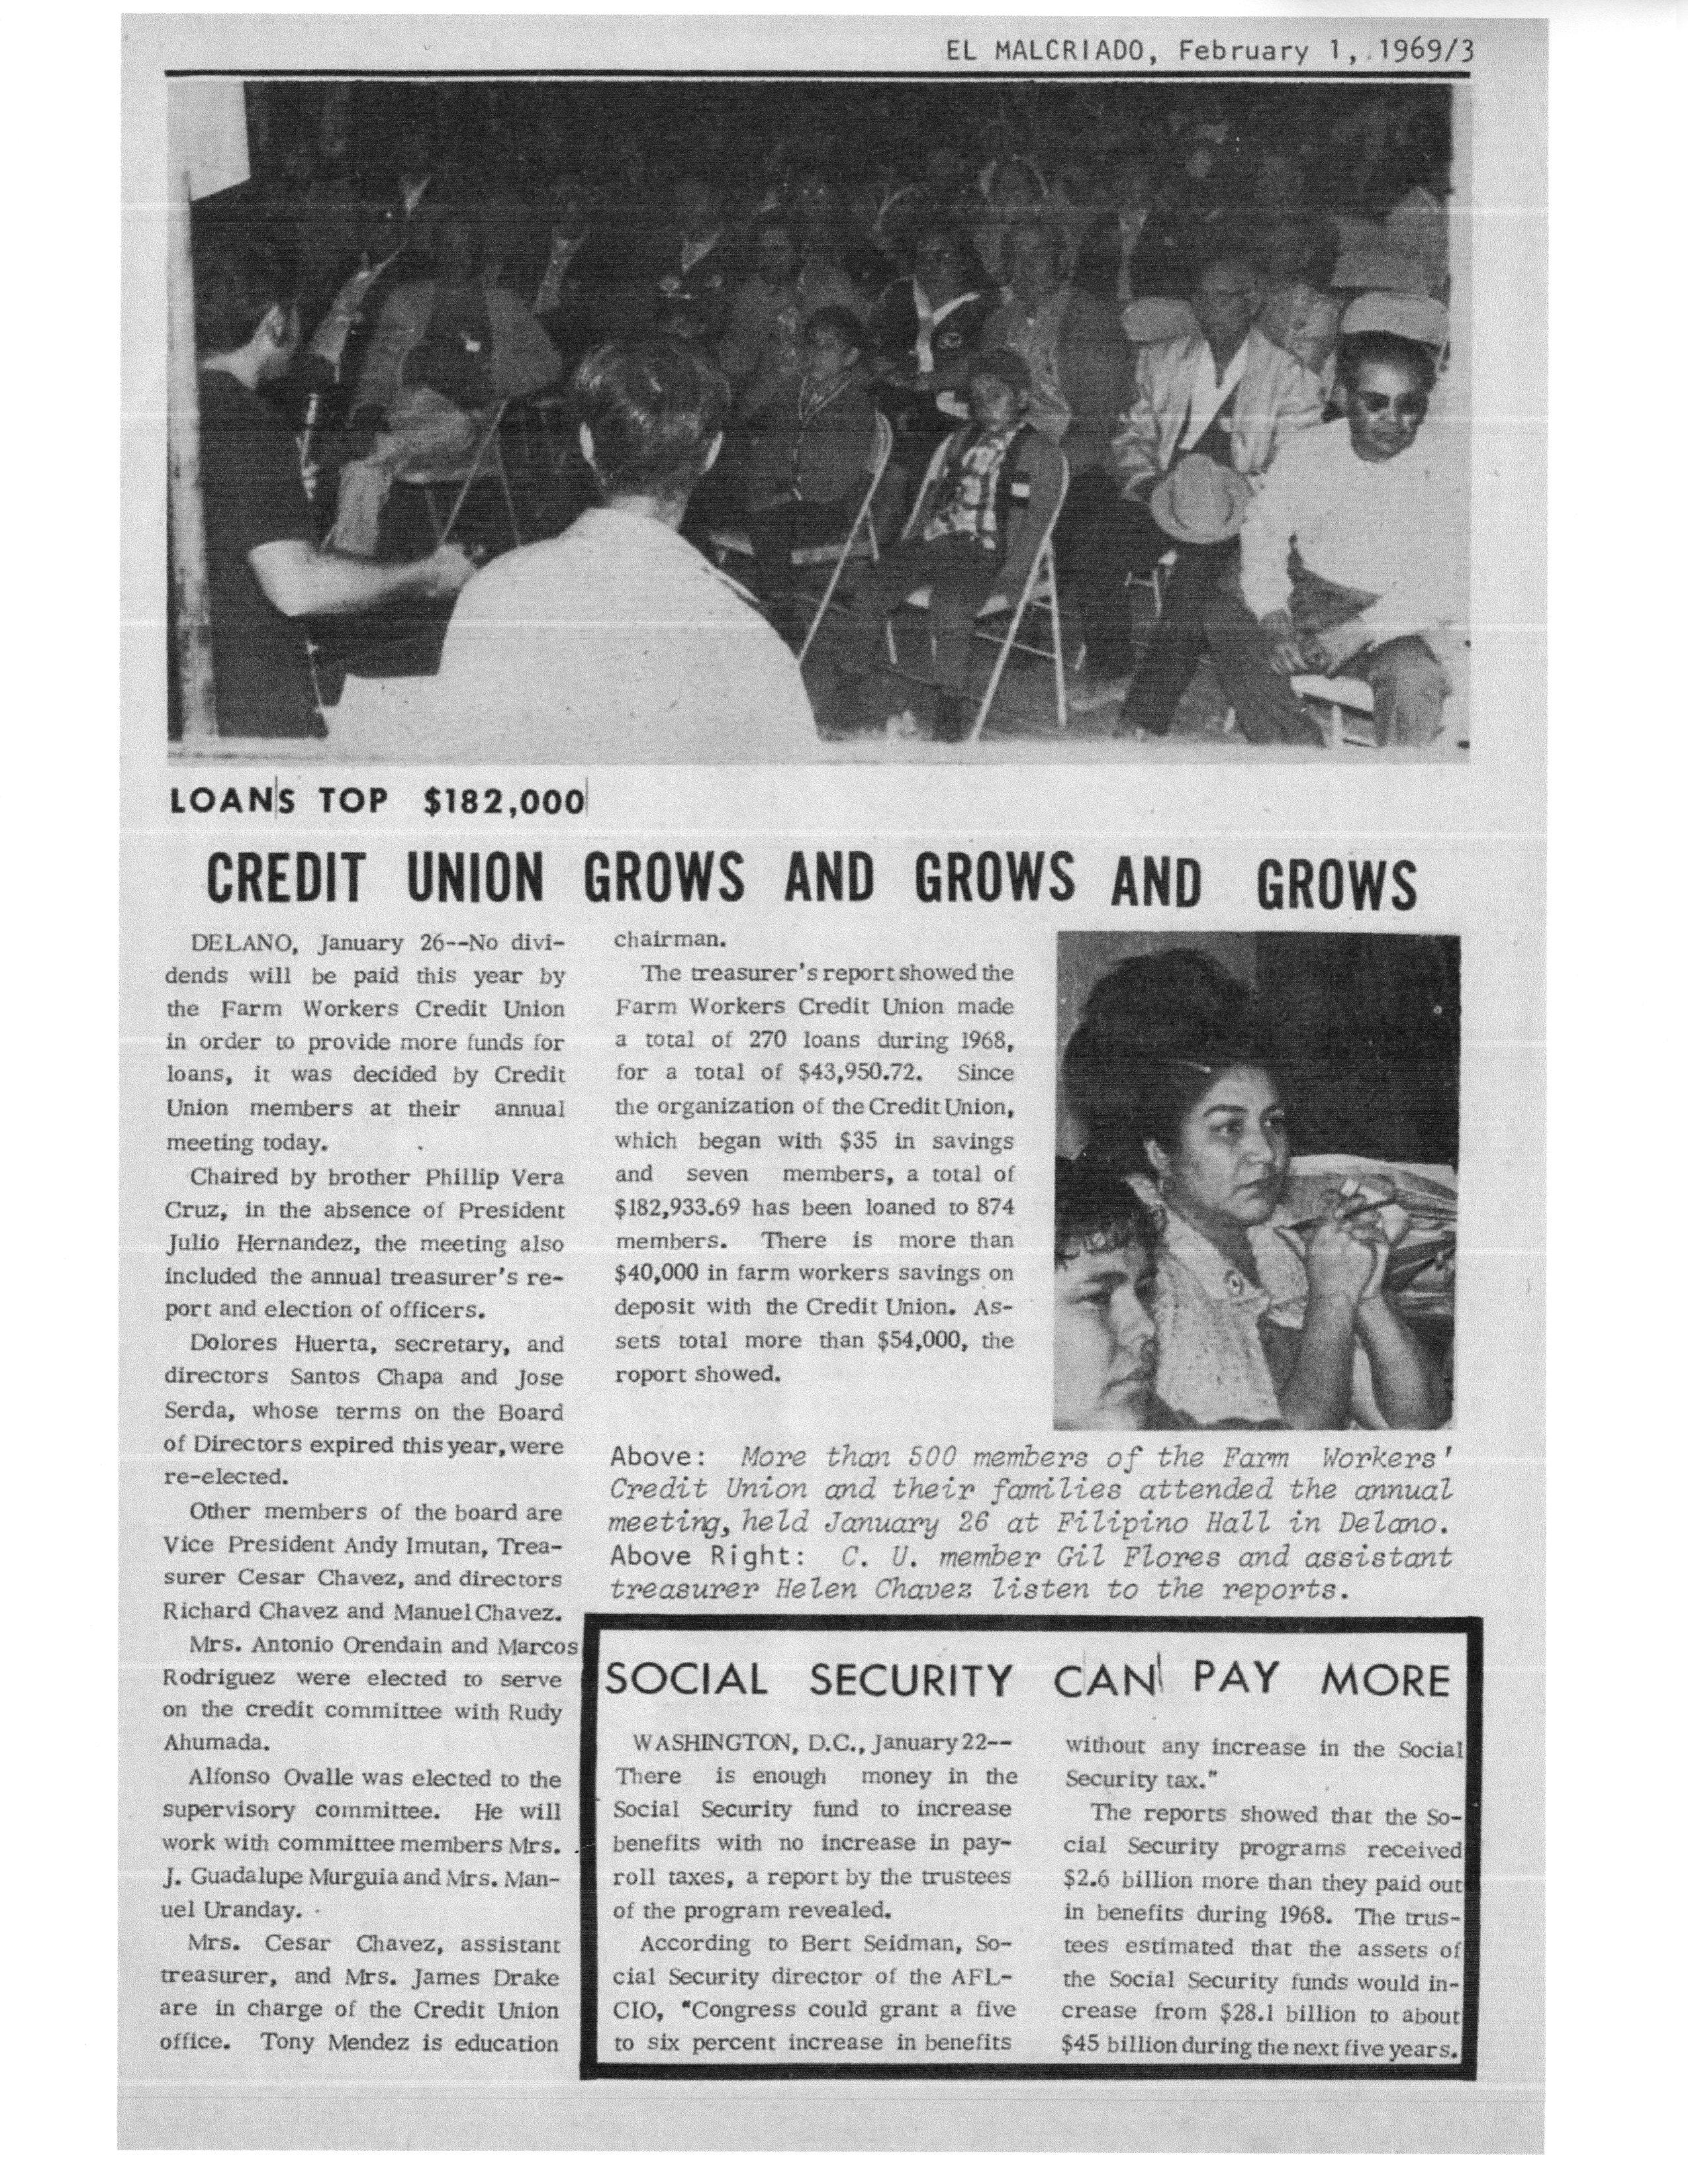 farm worker credit union essay photos acirc farmworker movement 1969